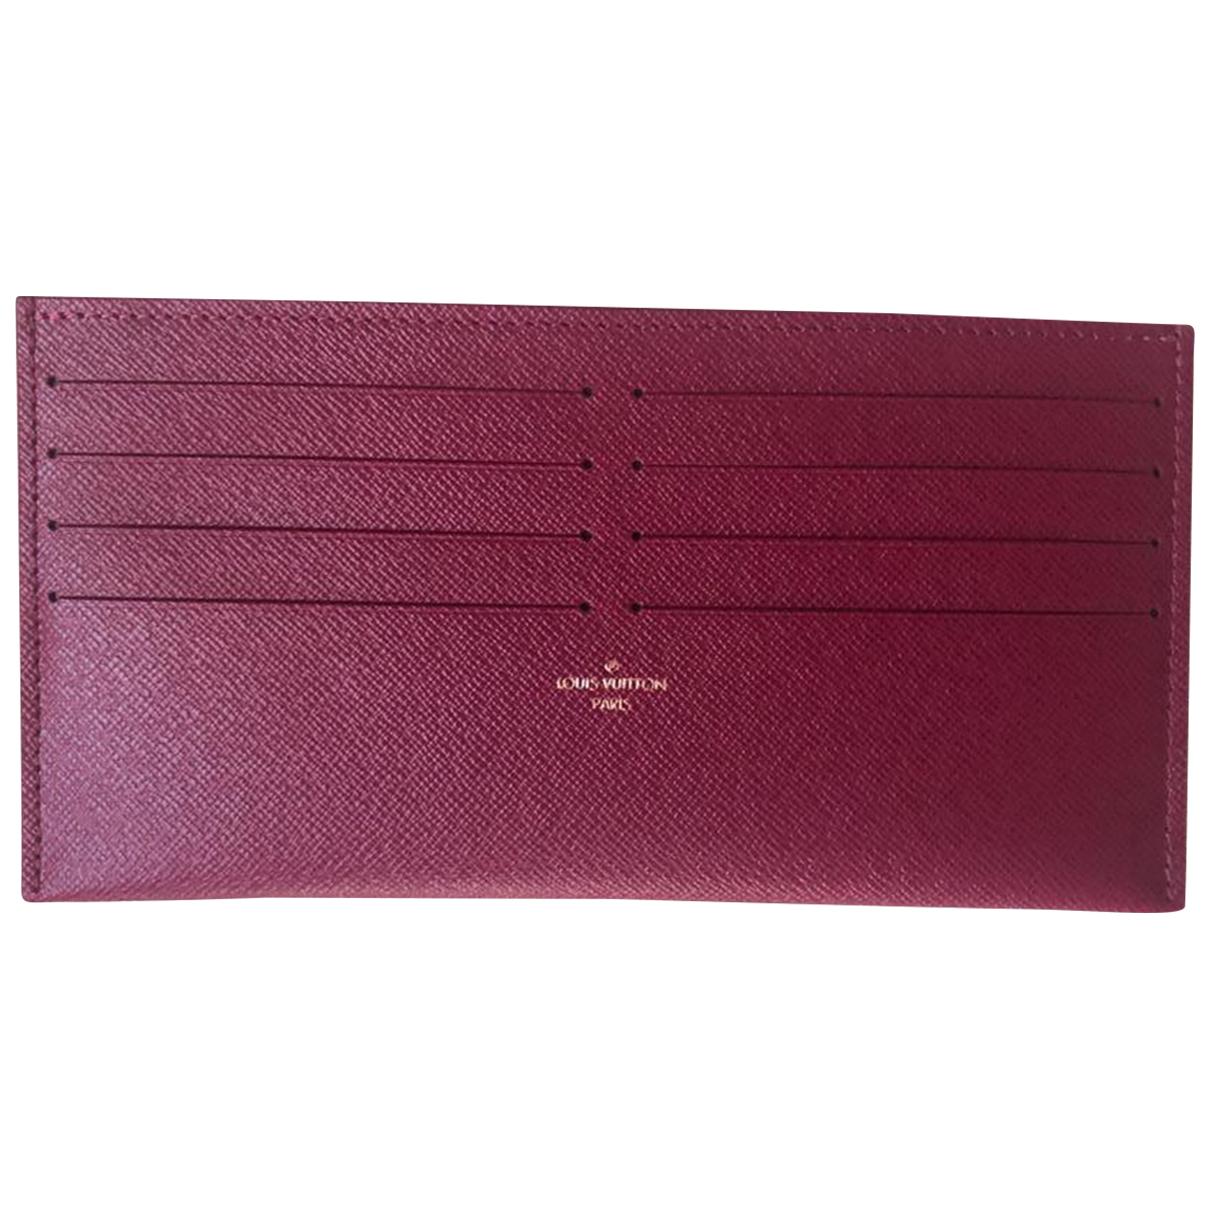 Louis Vuitton \N Kleinlederwaren in  Bordeauxrot Leder